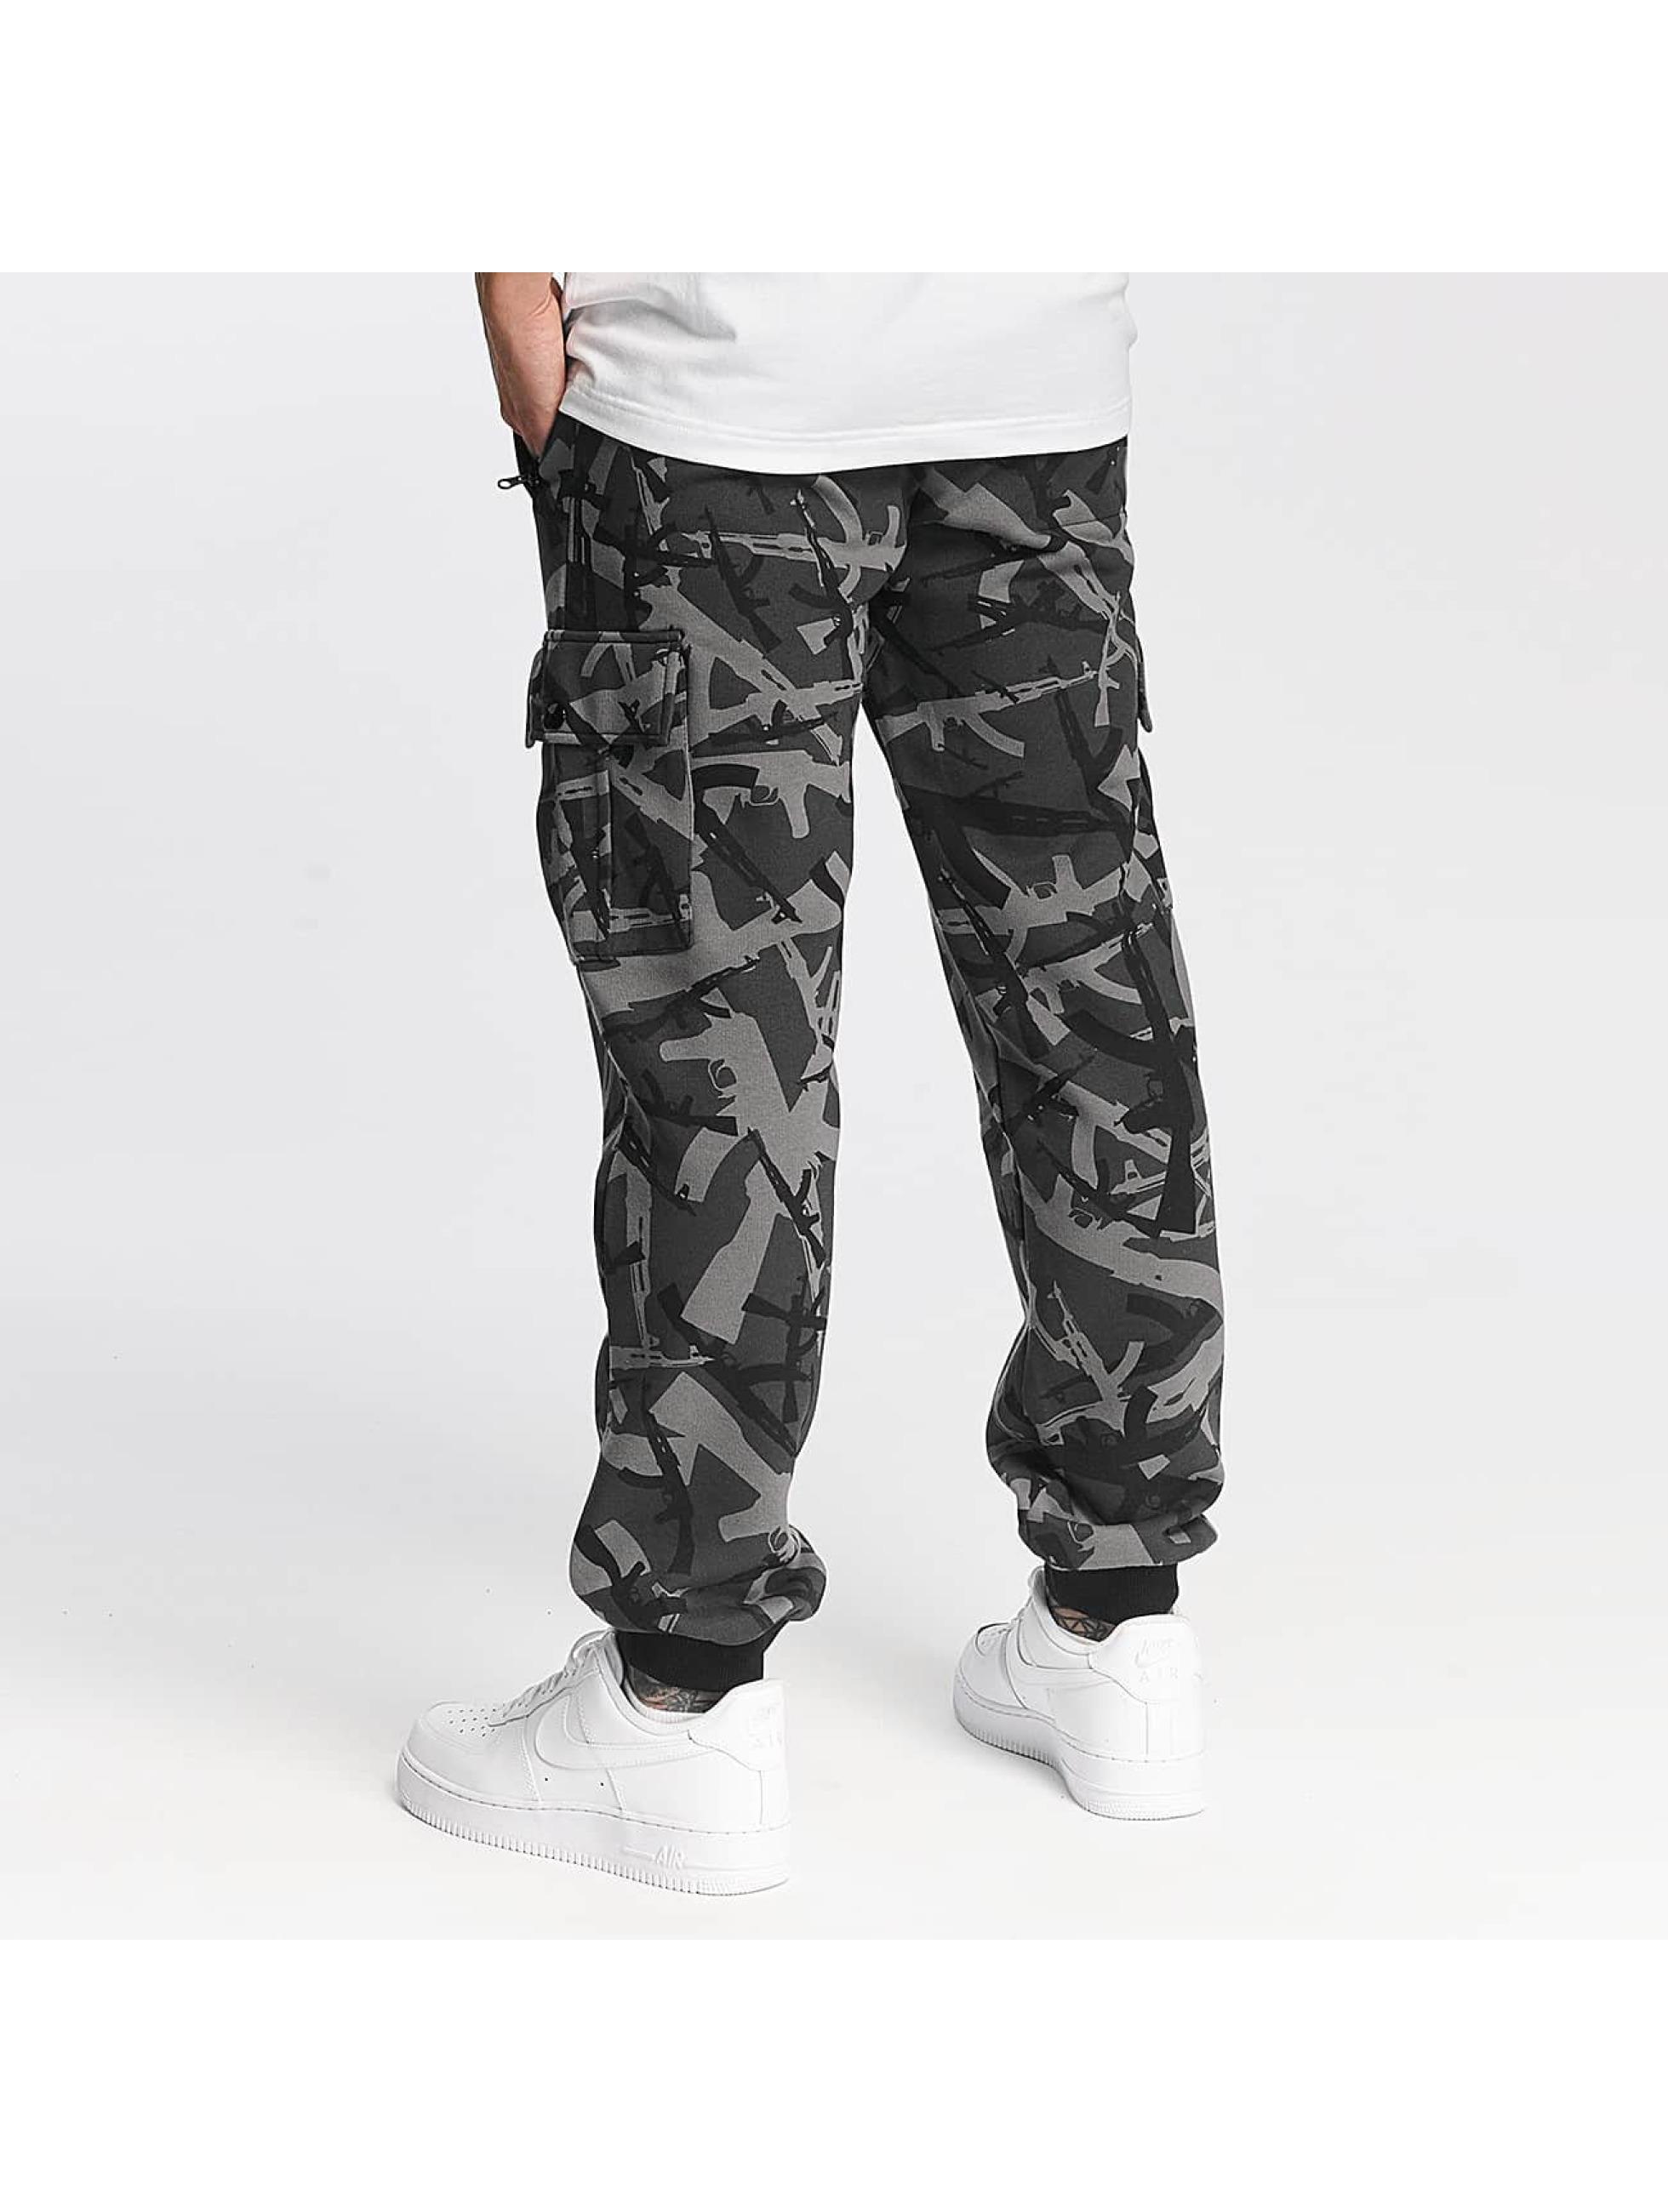 Pusher Apparel Pantalone ginnico AK Camo mimetico